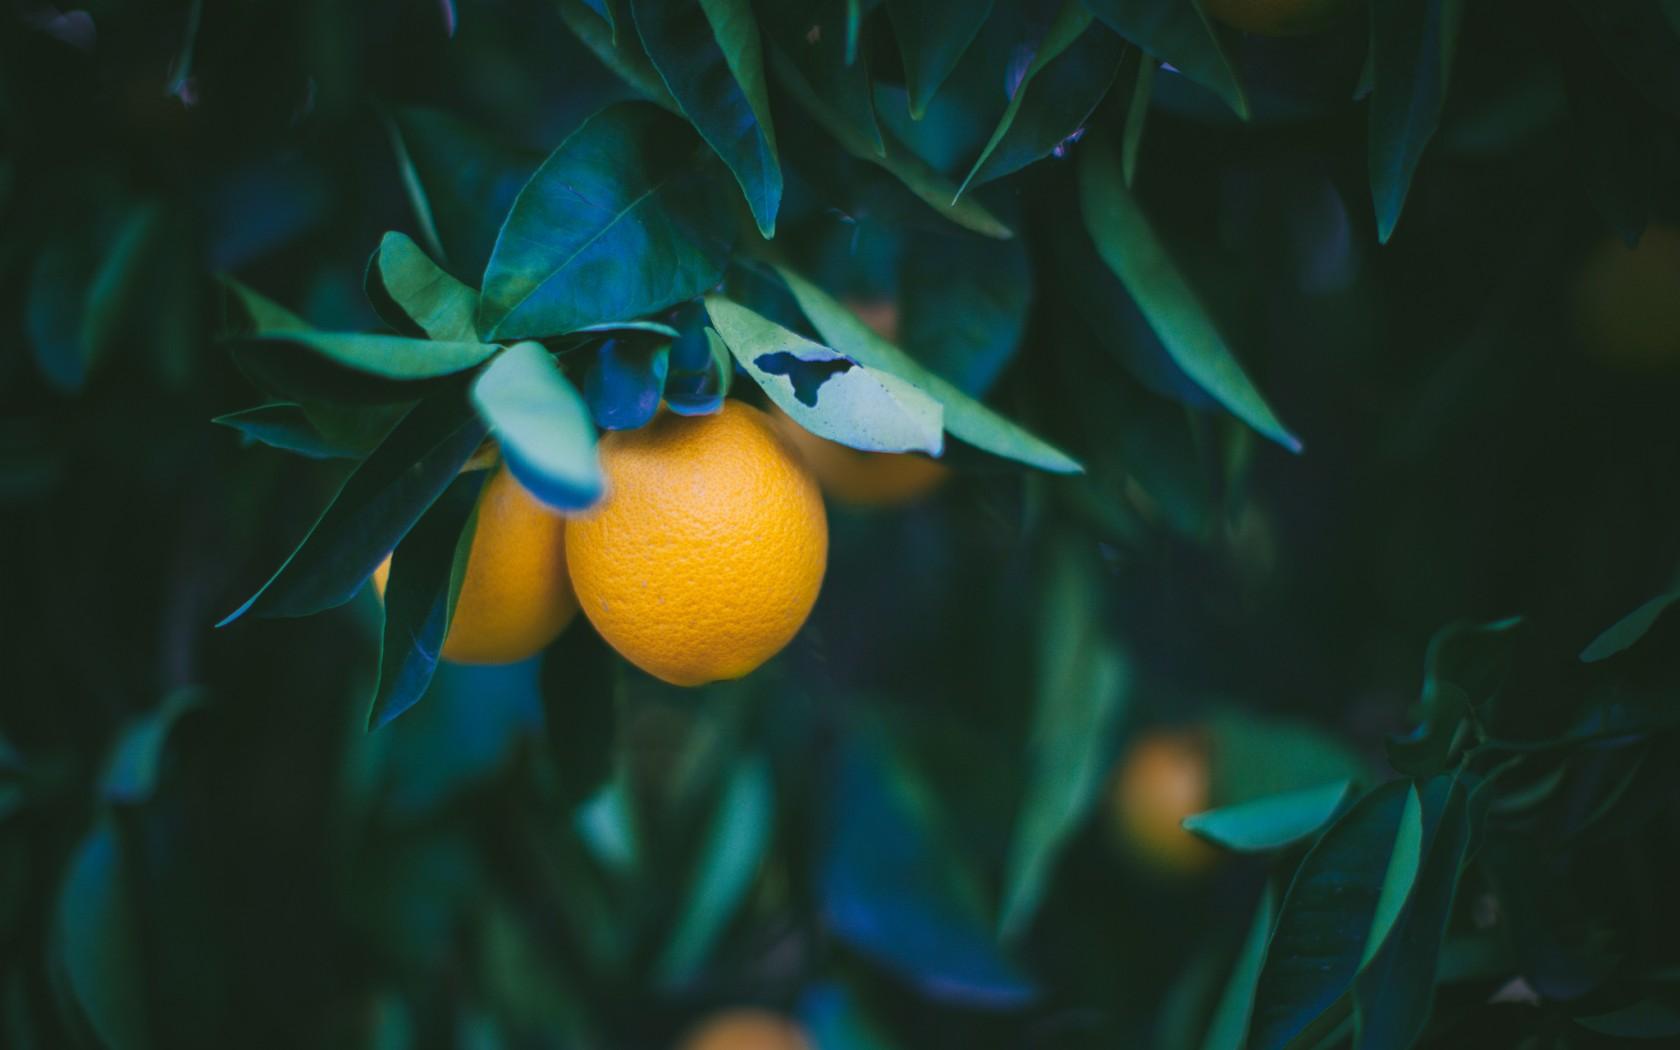 Hintergrundbilder : Sonnenlicht, Blätter, Betrachtung, Fisch, Frucht ...